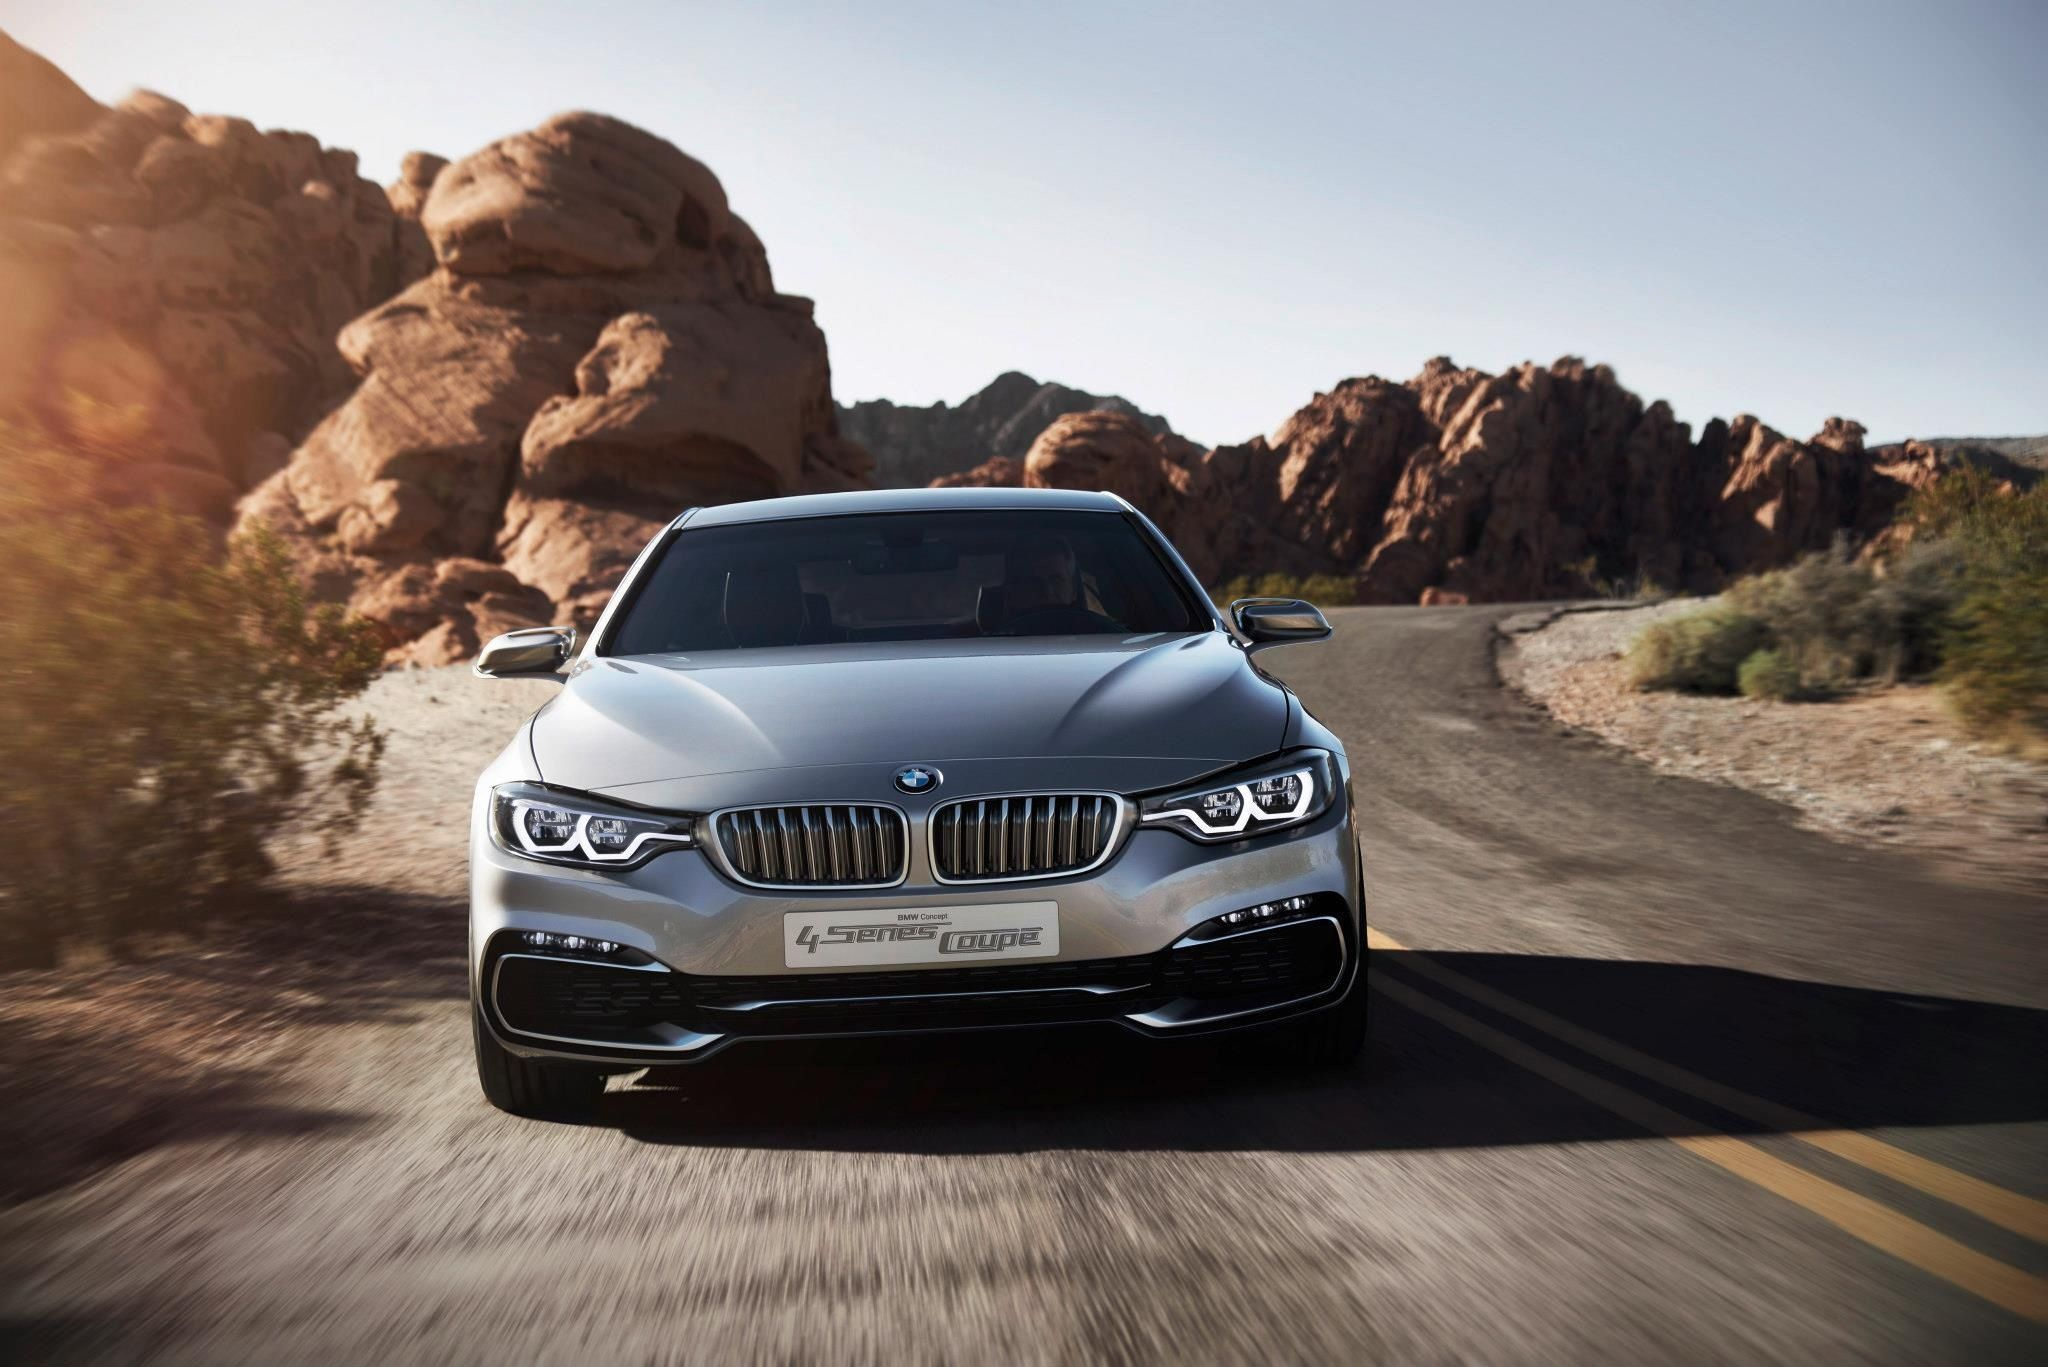 BMW 4 series (с изображениями) | Автомобили, Галерея